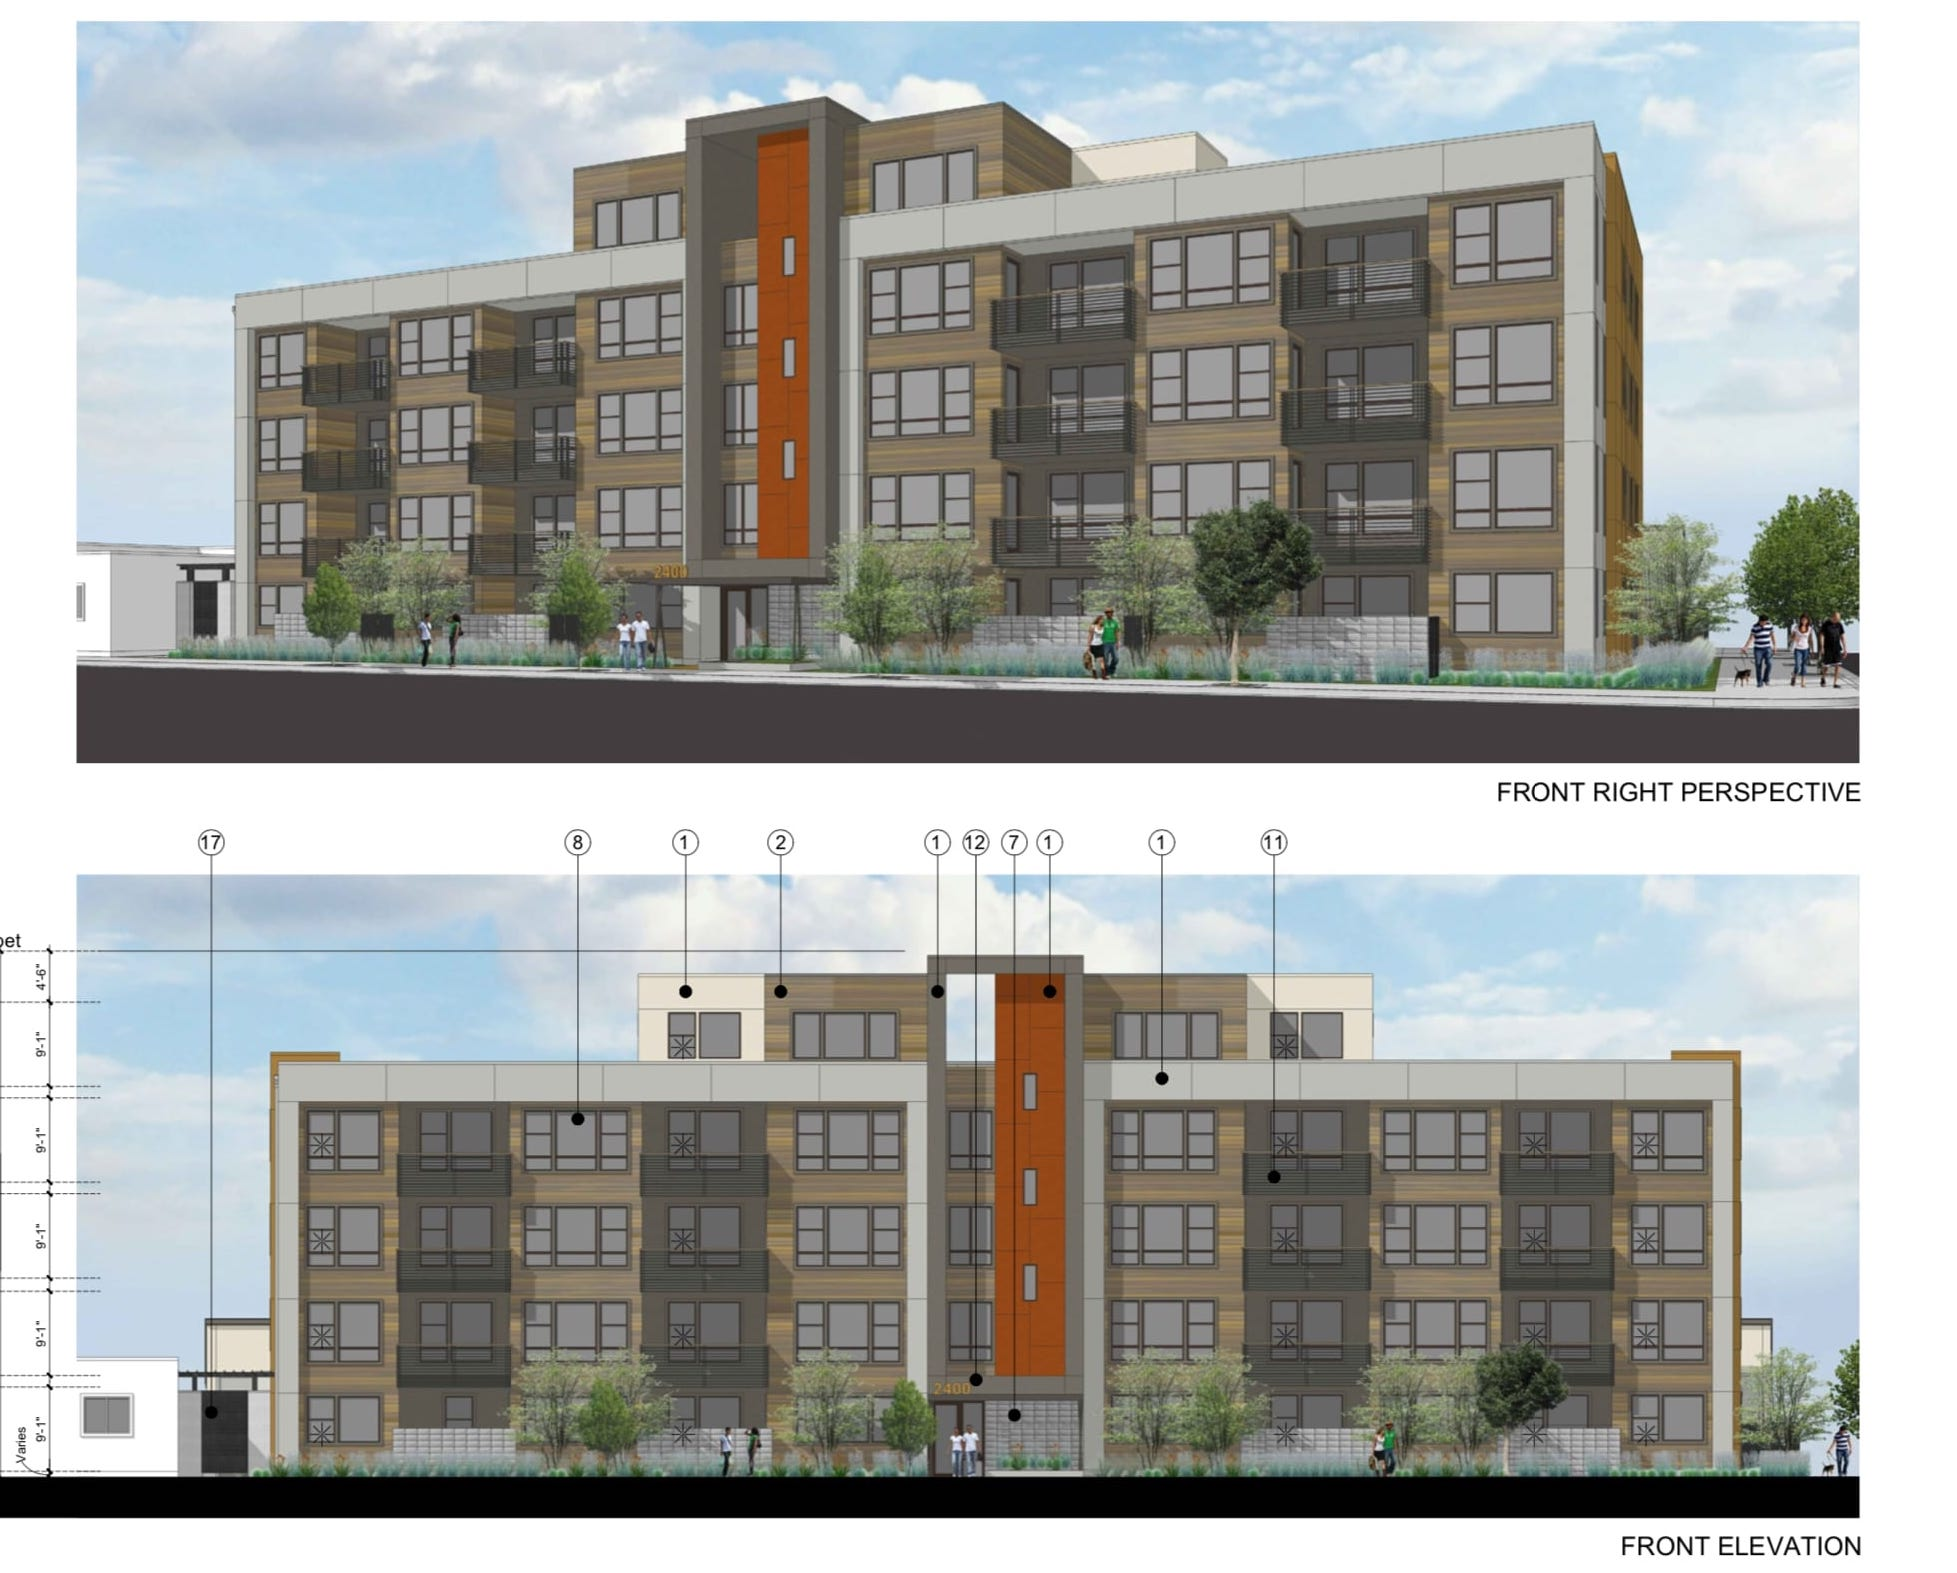 2400 Adeline Street Conceptual Elevations